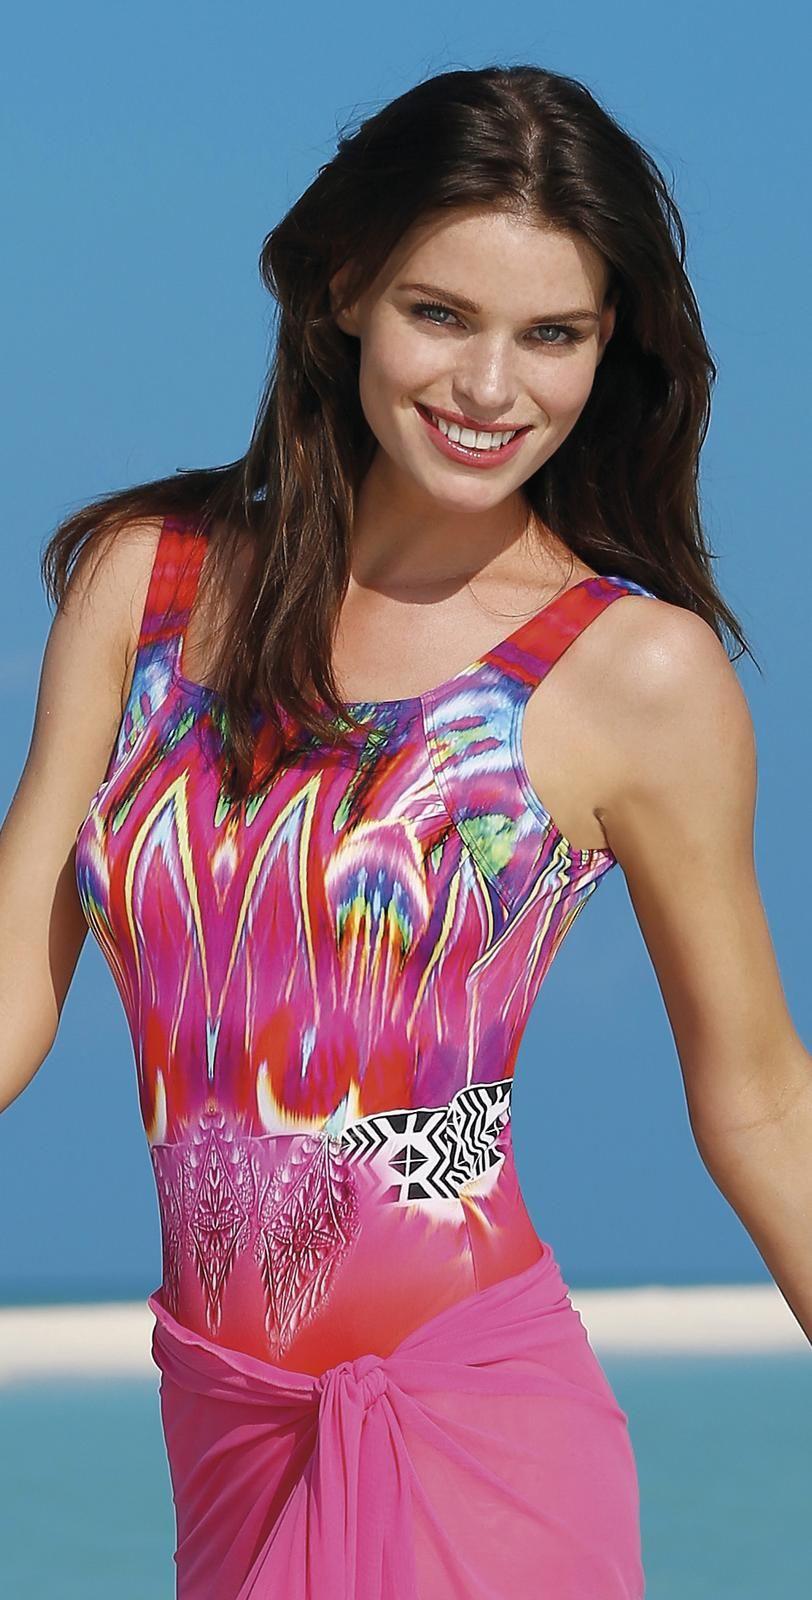 d33de0344013a Sunflair  2015 Greek Sunset  Mastectomy  Swimsuit